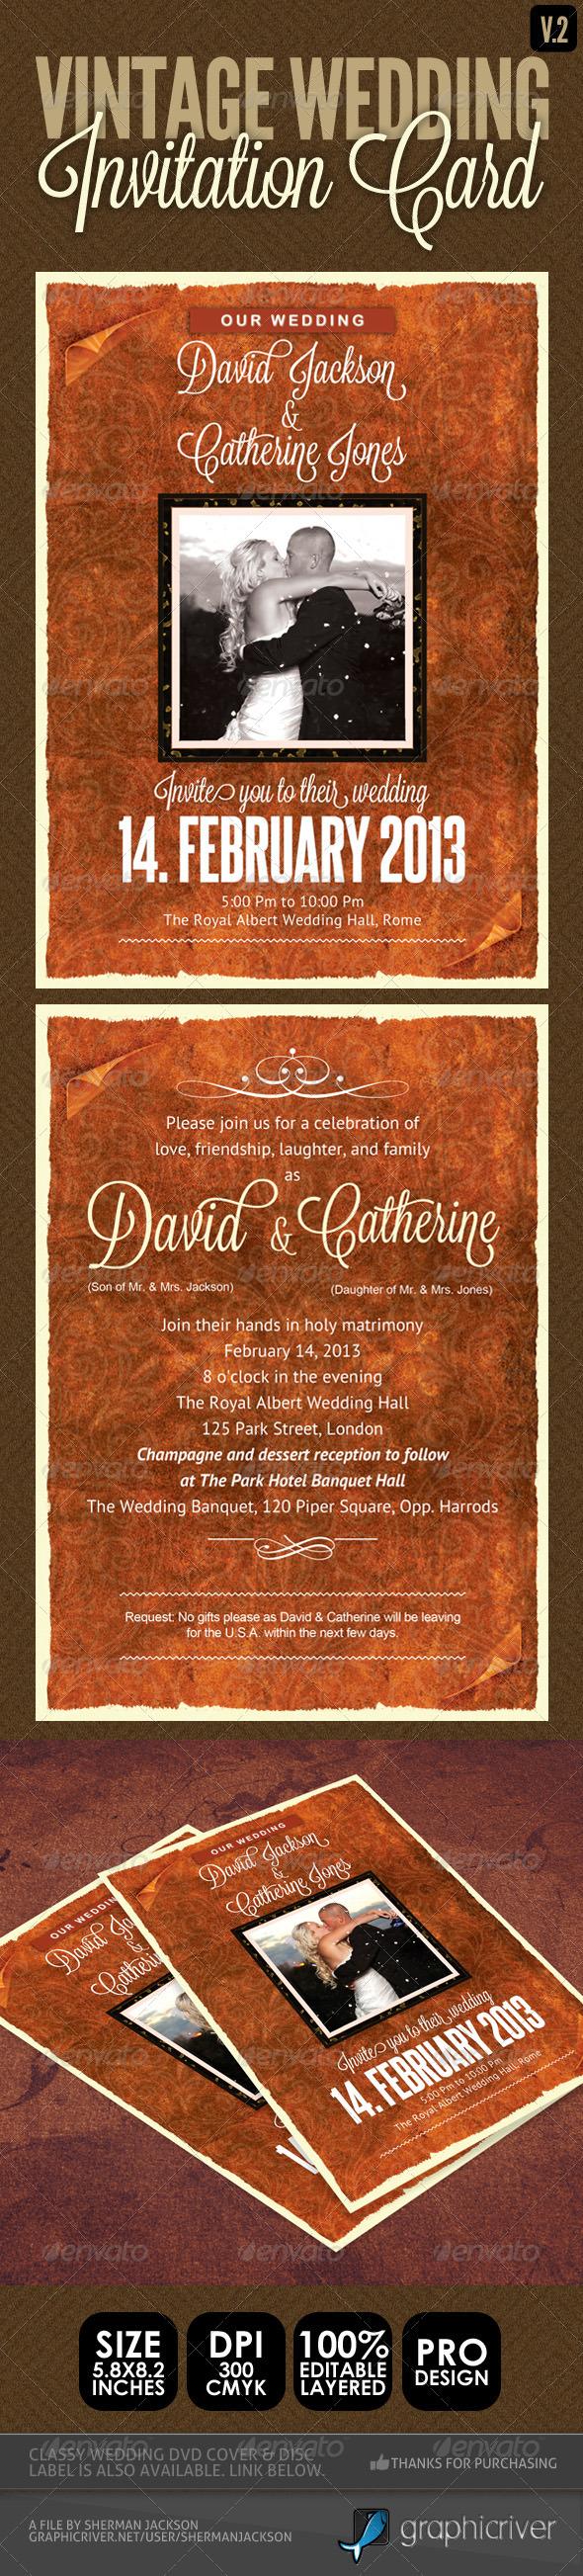 GraphicRiver Vintage Wedding Invitation Card V.2 4008371